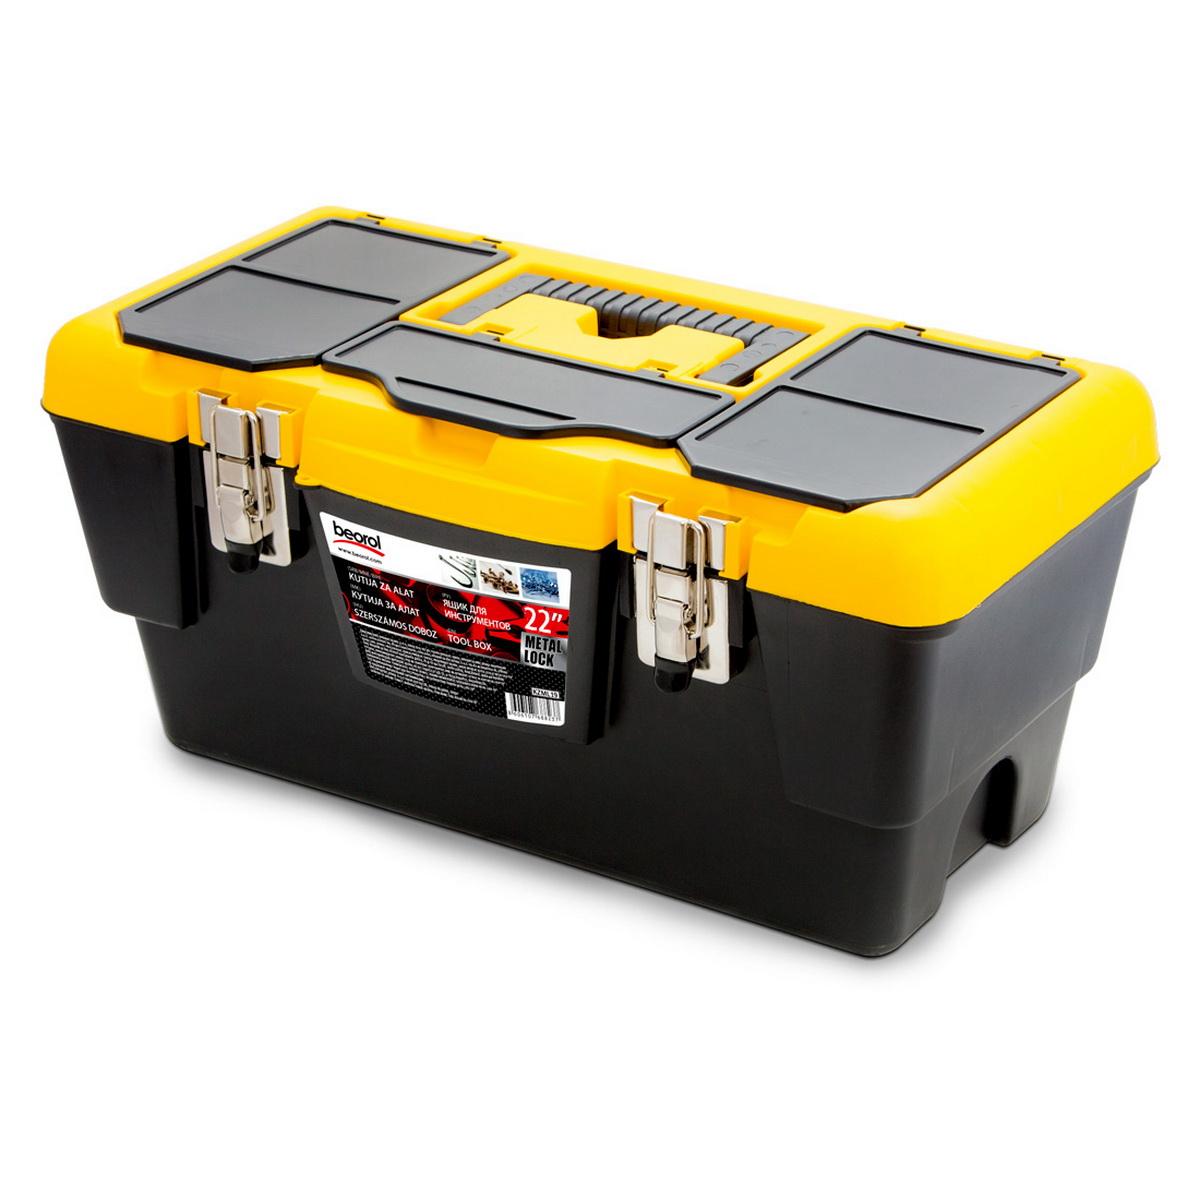 SIERRA GLOVE BOX LOCK 9790